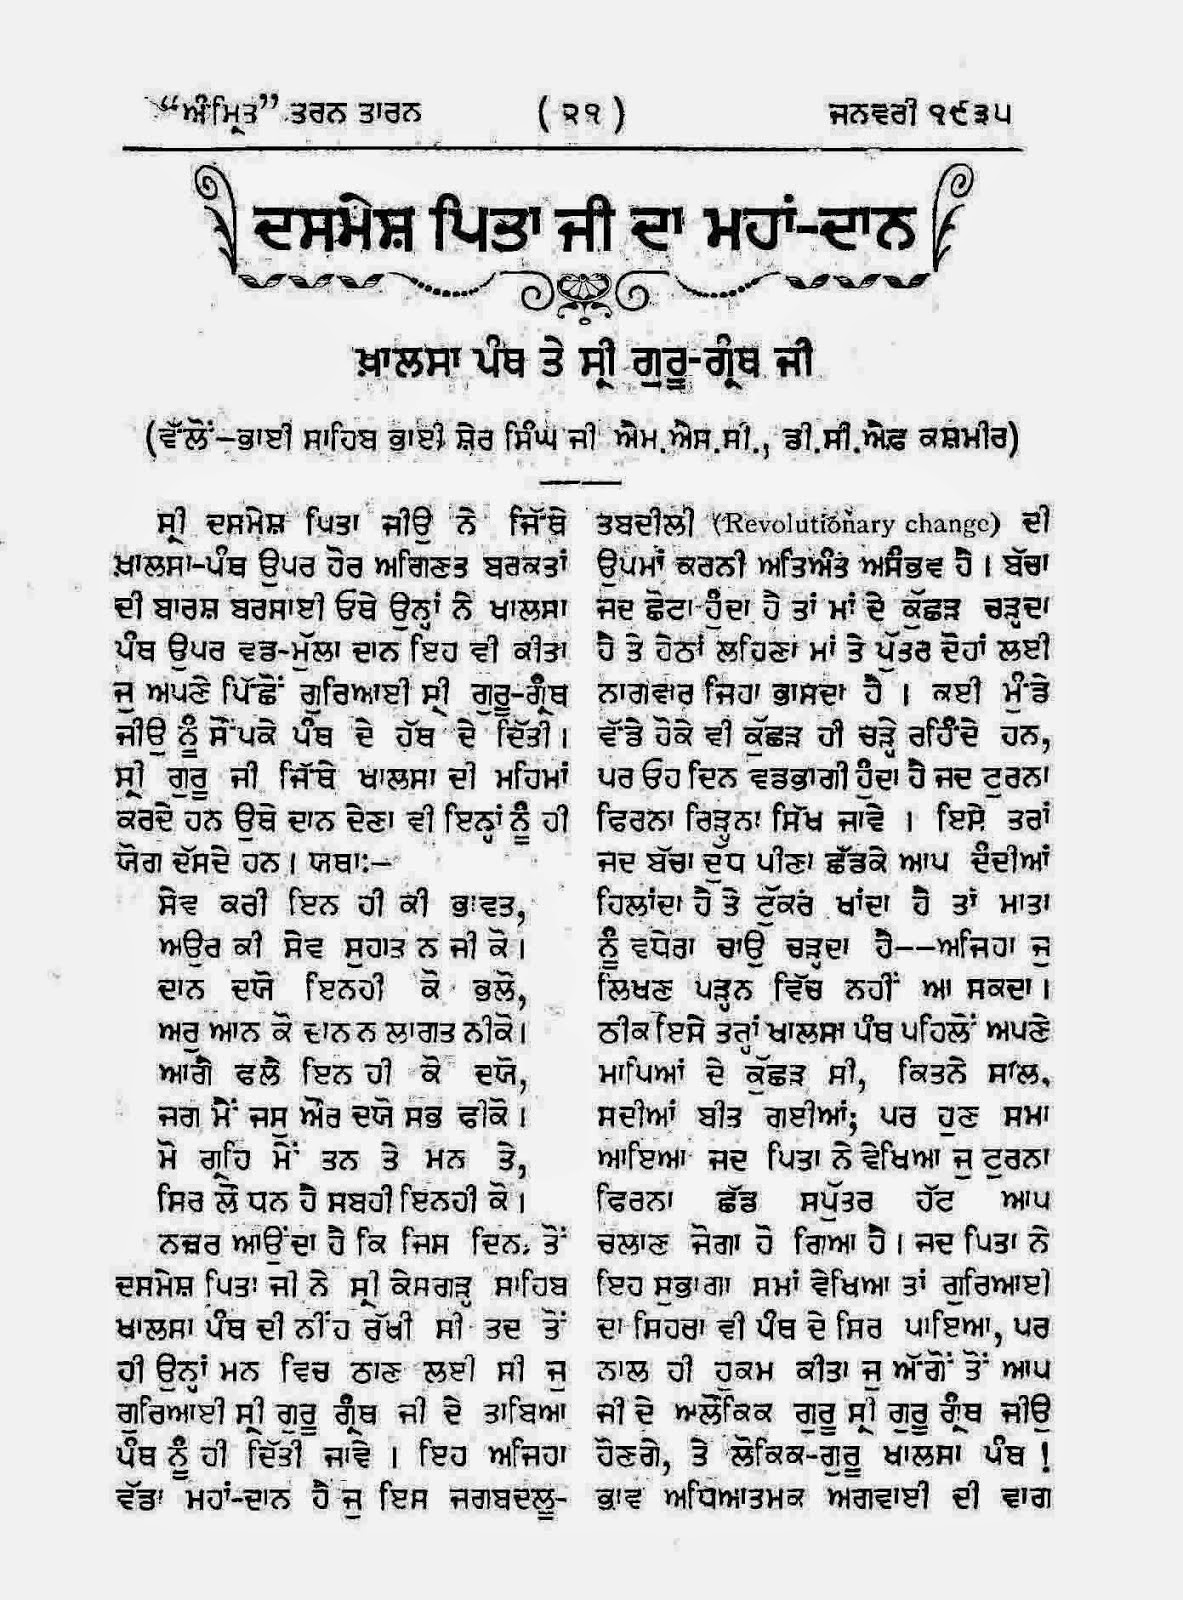 essay on guru teg bahadur ji in punjabi